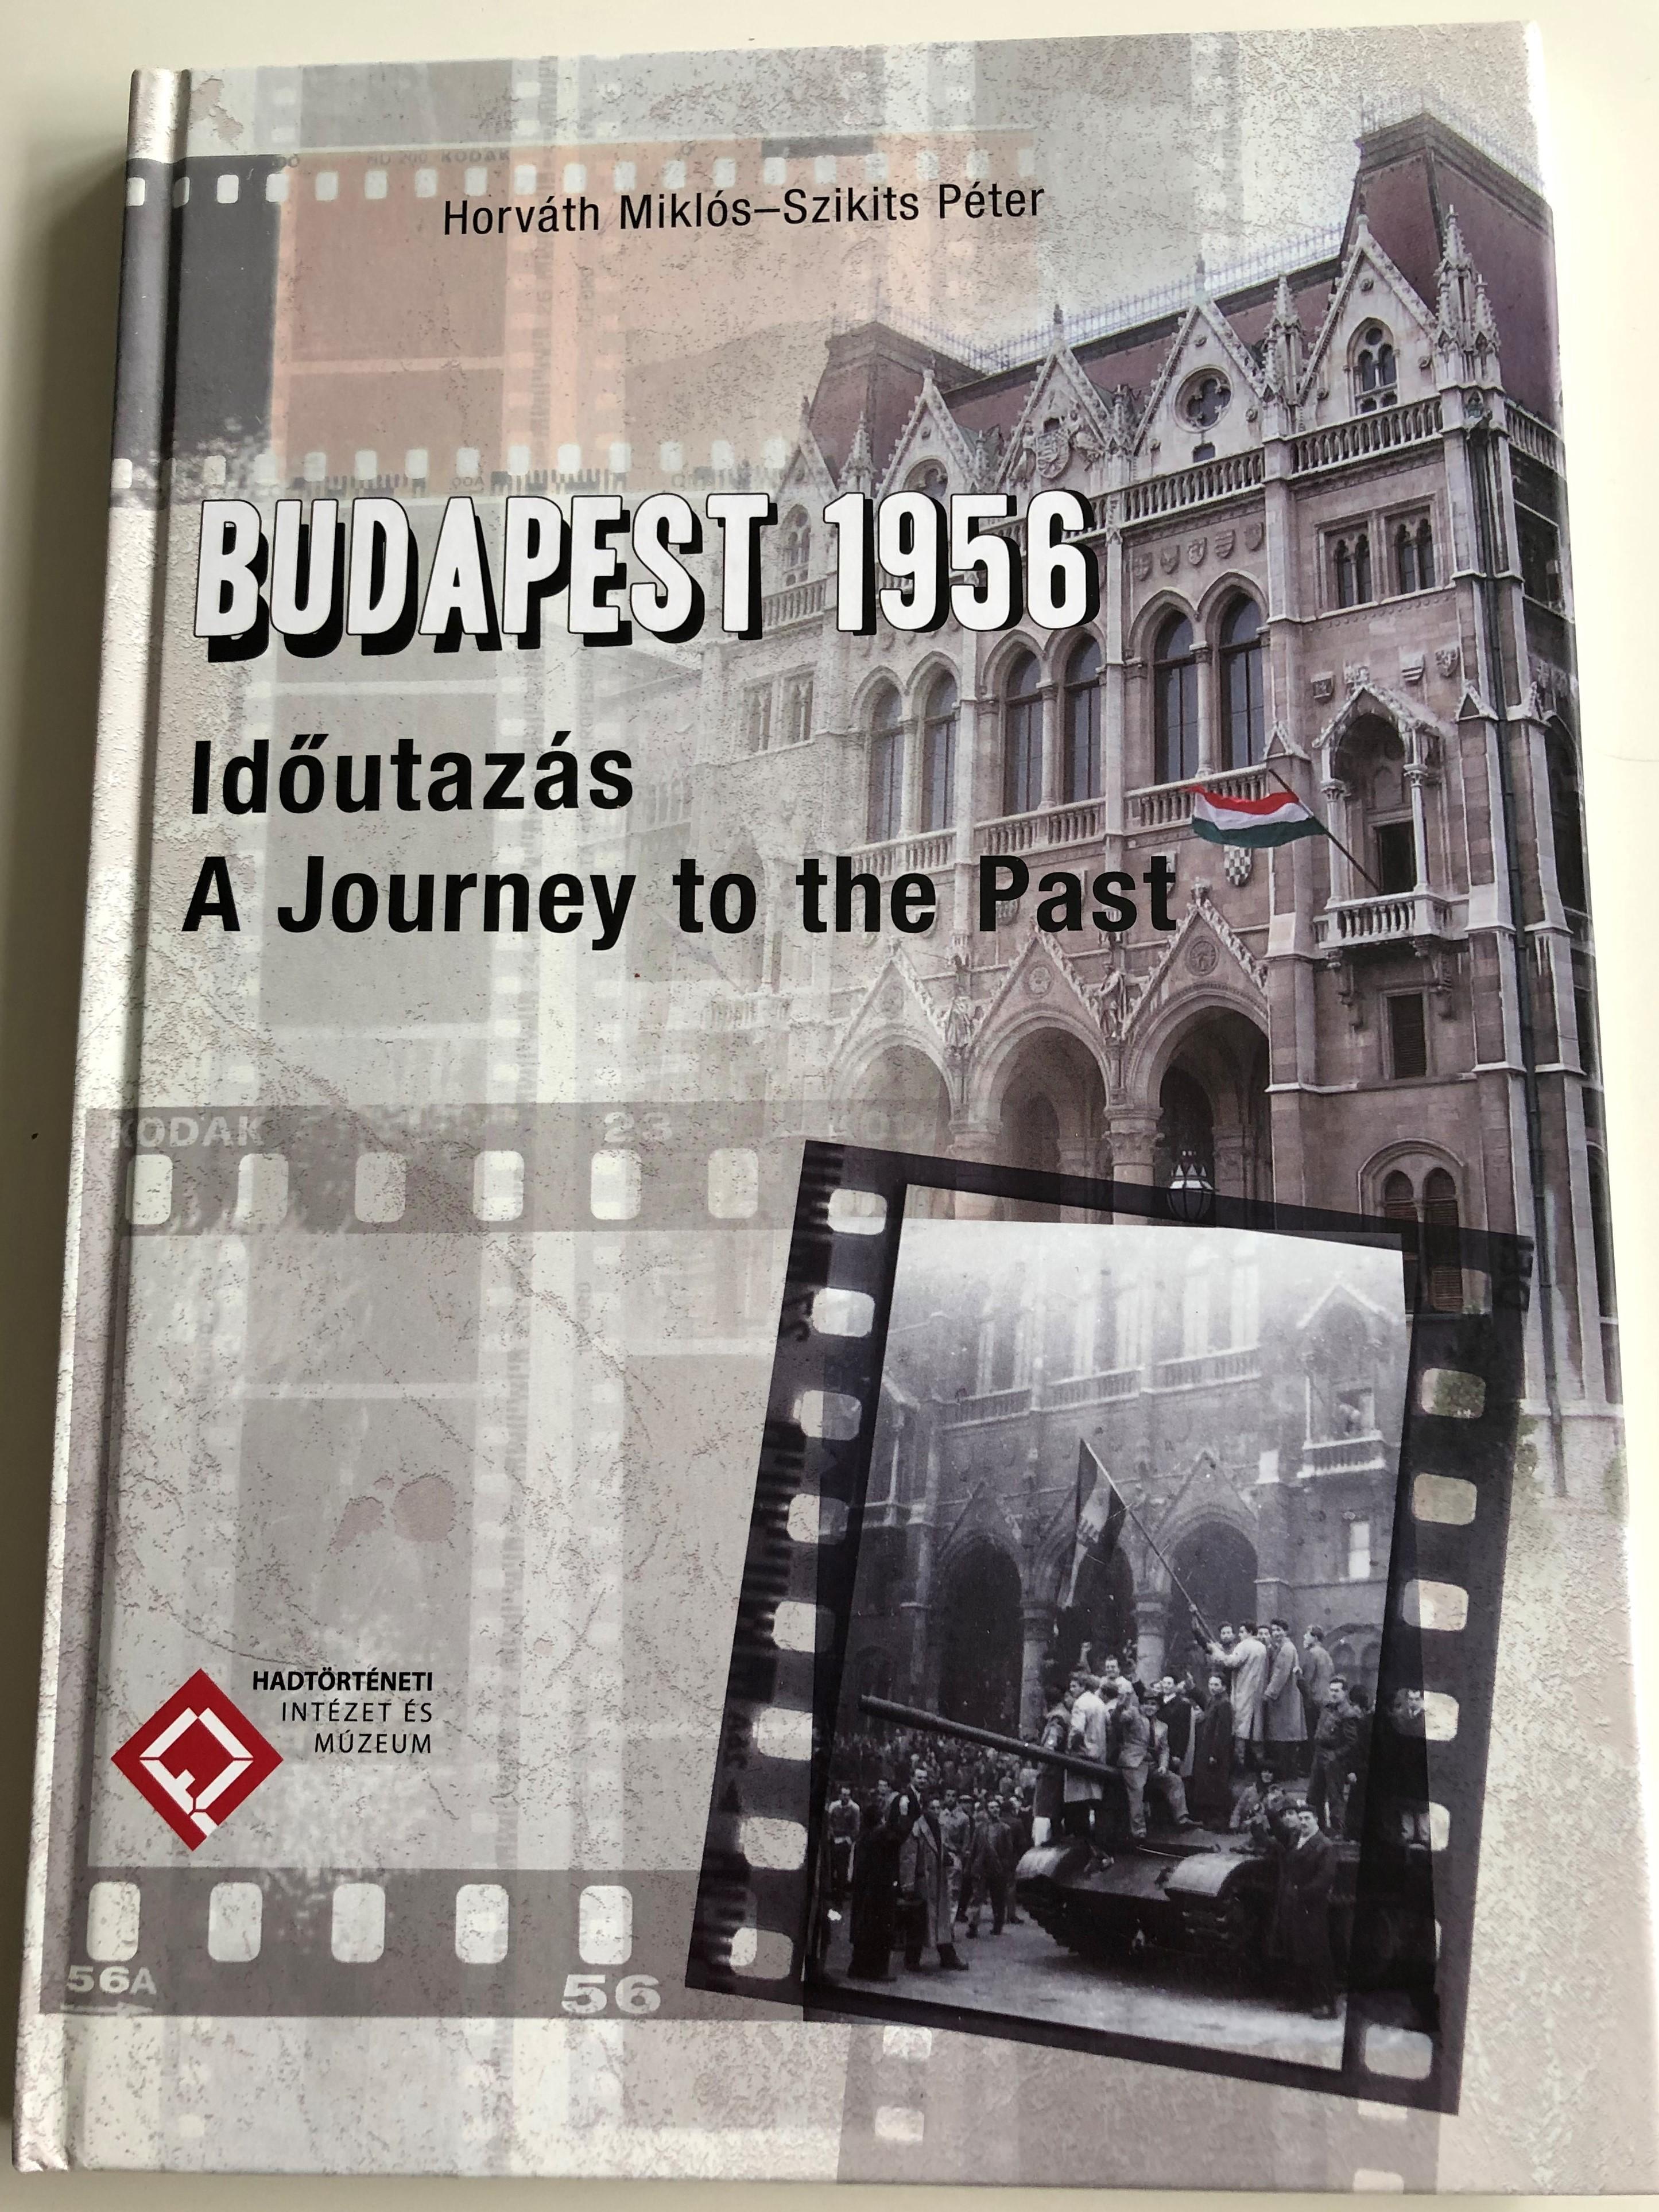 budapest-1956-id-utaz-s-a-journey-to-the-past-by-horv-th-mikl-s-szikits-p-ter-hadt-rt-neti-int-zet-s-m-zeum-hardcover-2016-1-.jpg